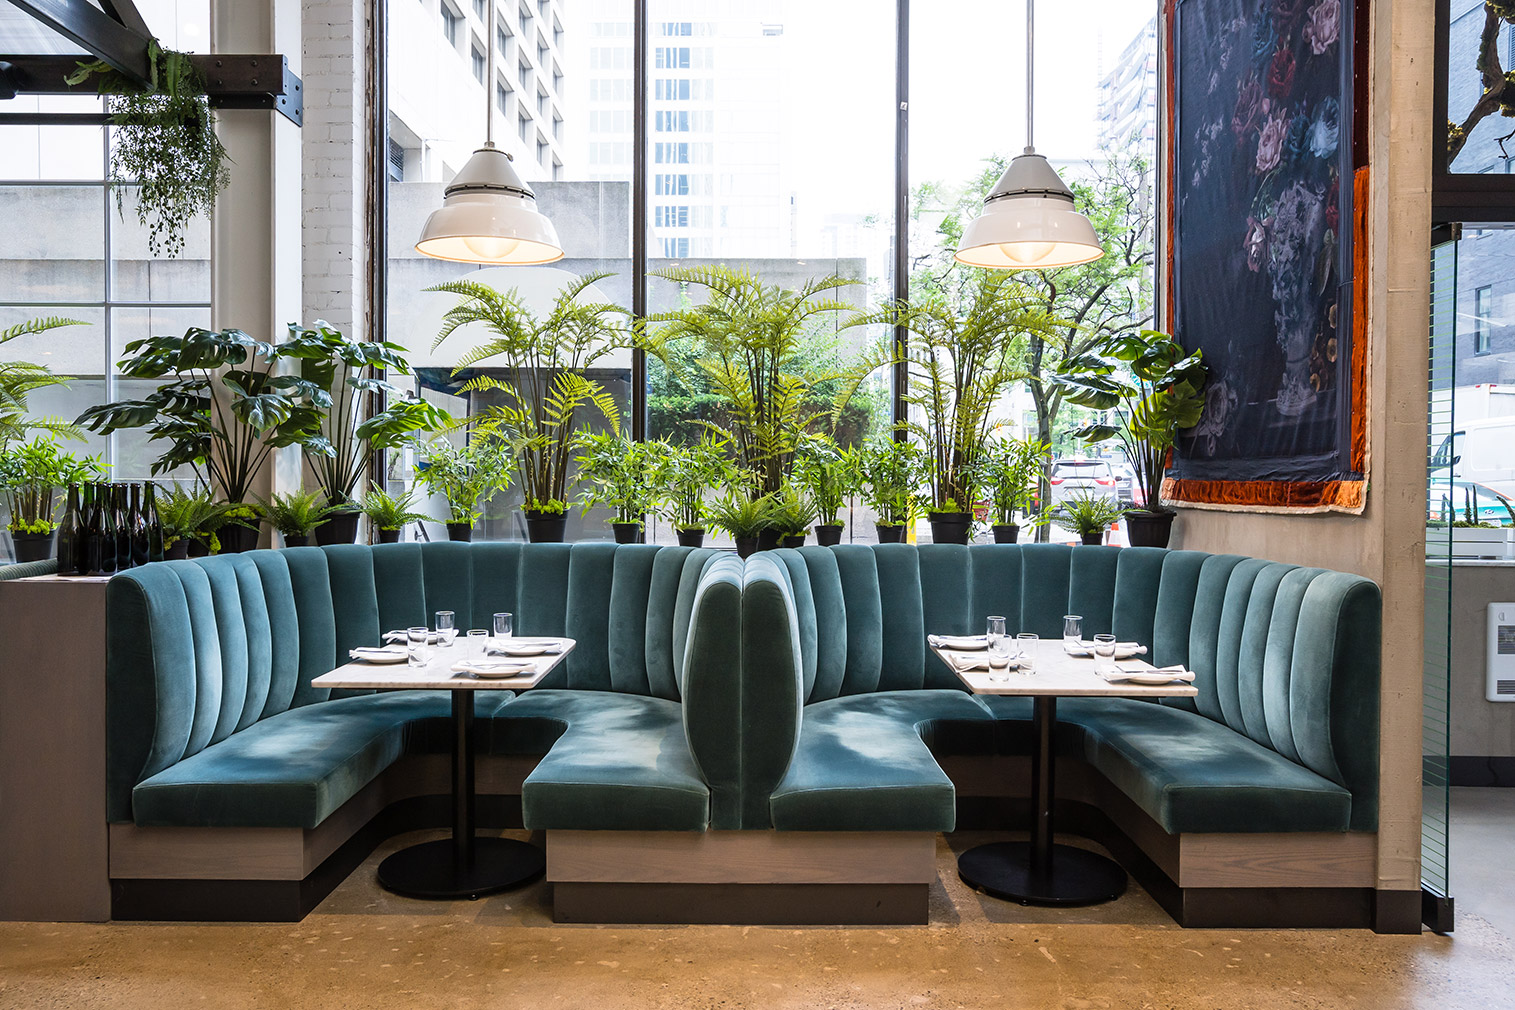 Design duo Brenda Bent and Karen Gable took inspiration from ruin porn for the interiors of Toronto restaurant Rosalinda